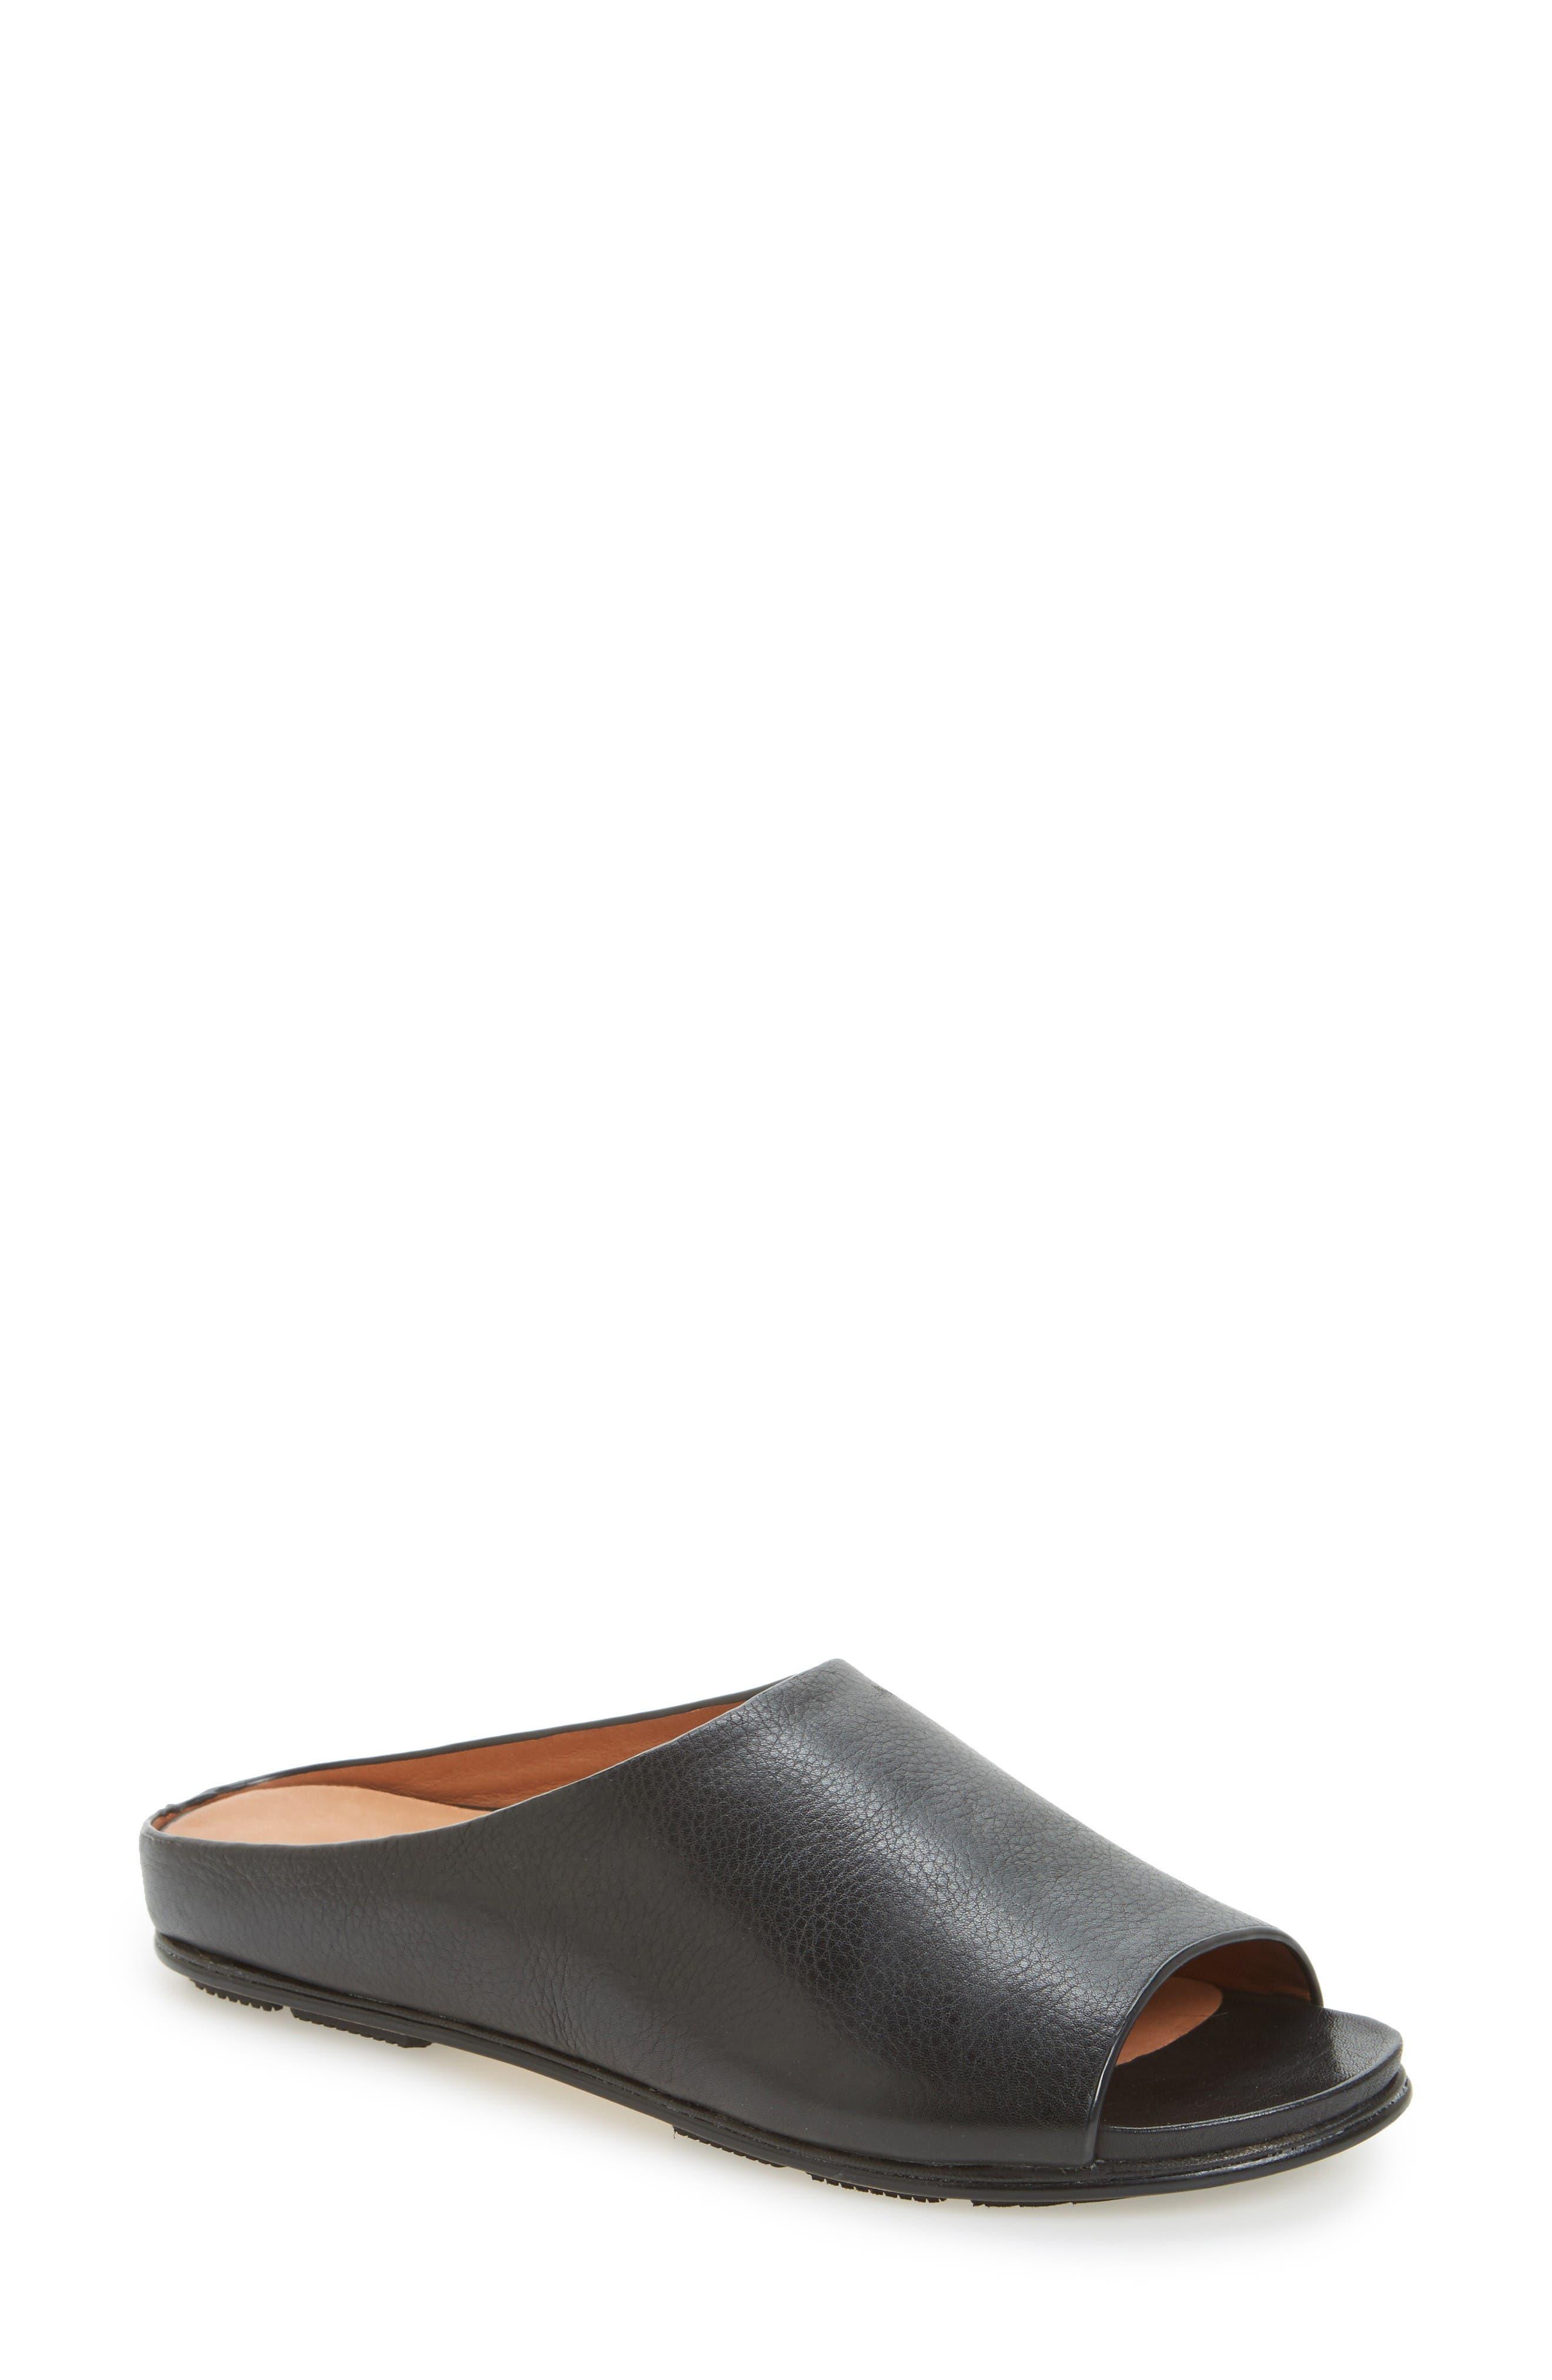 Dijone Mule,                             Main thumbnail 1, color,                             Black Leather